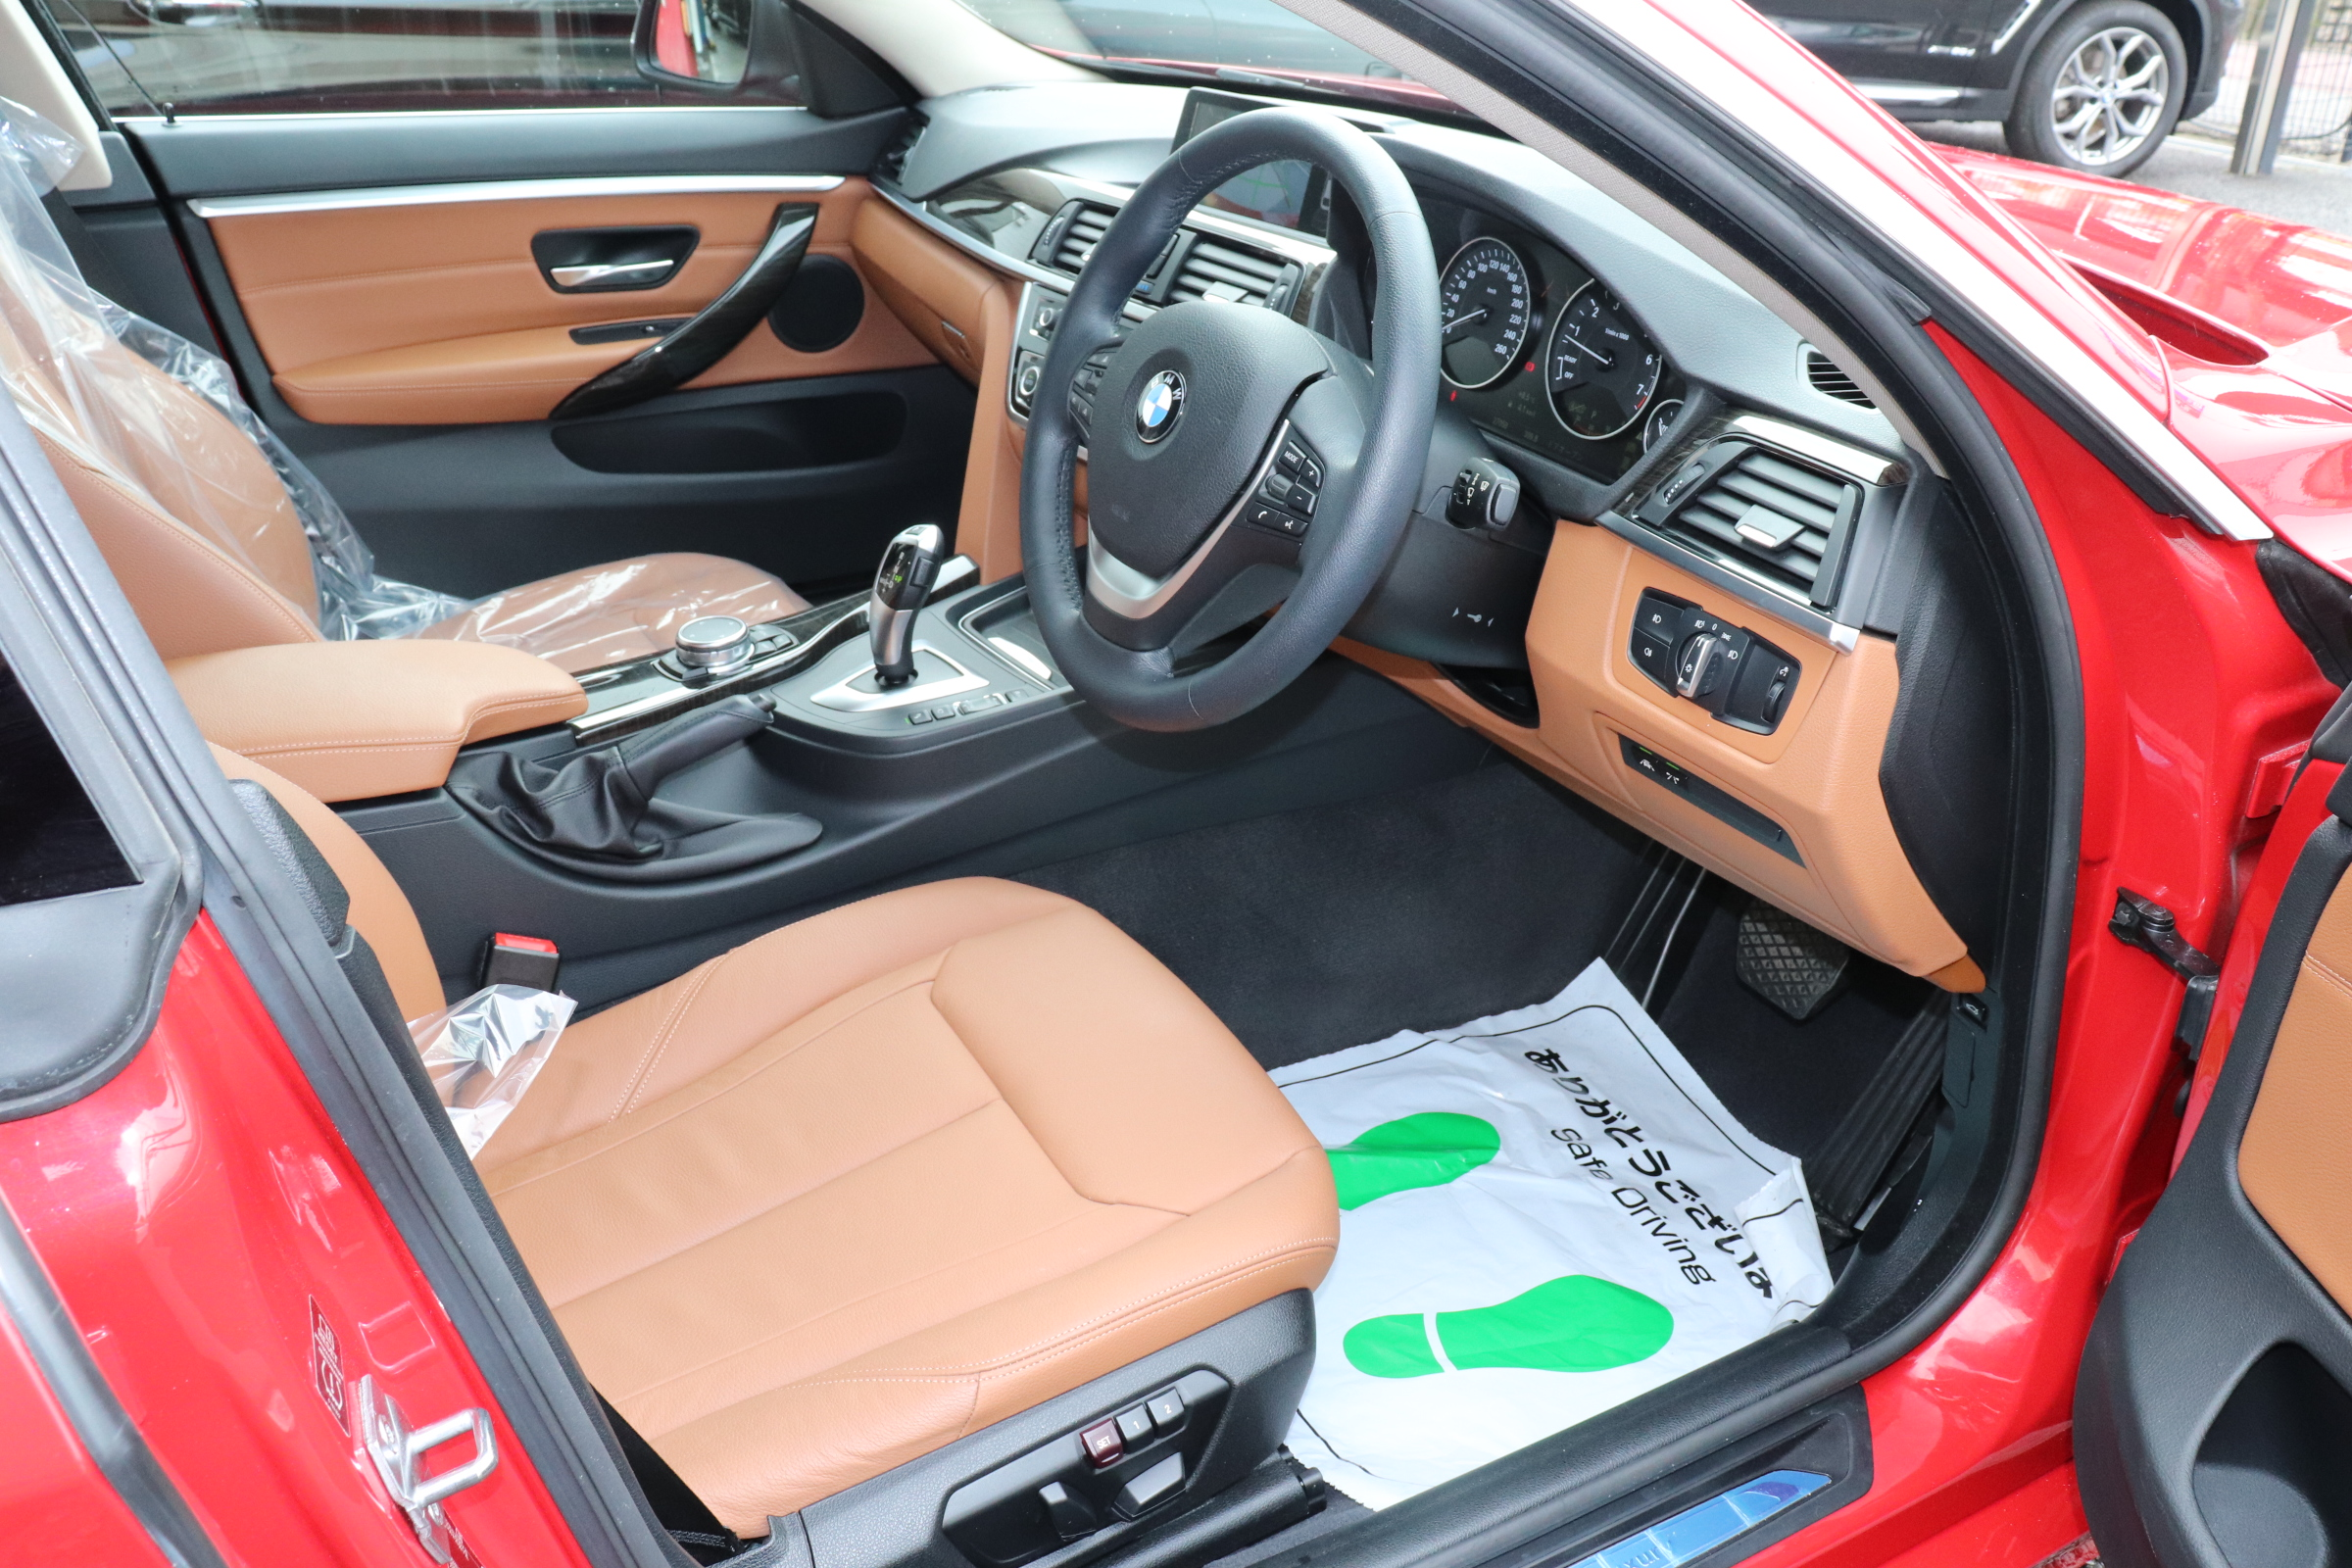 420iグランクーペラグジュアリーBEAMコンプリートカー 茶革 LEDヘッドライト車両画像11